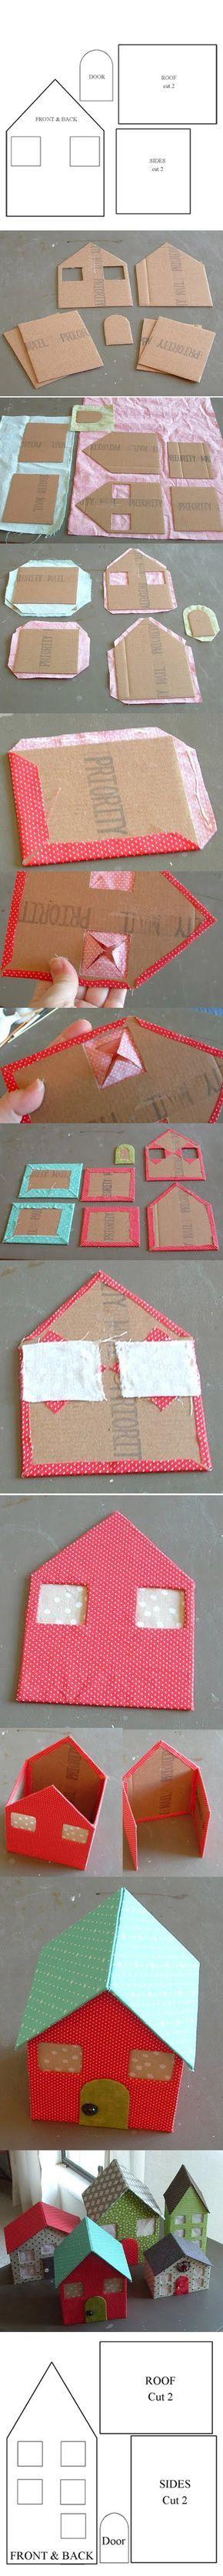 casa-juguete-carton-muy-ingenioso-1-diy